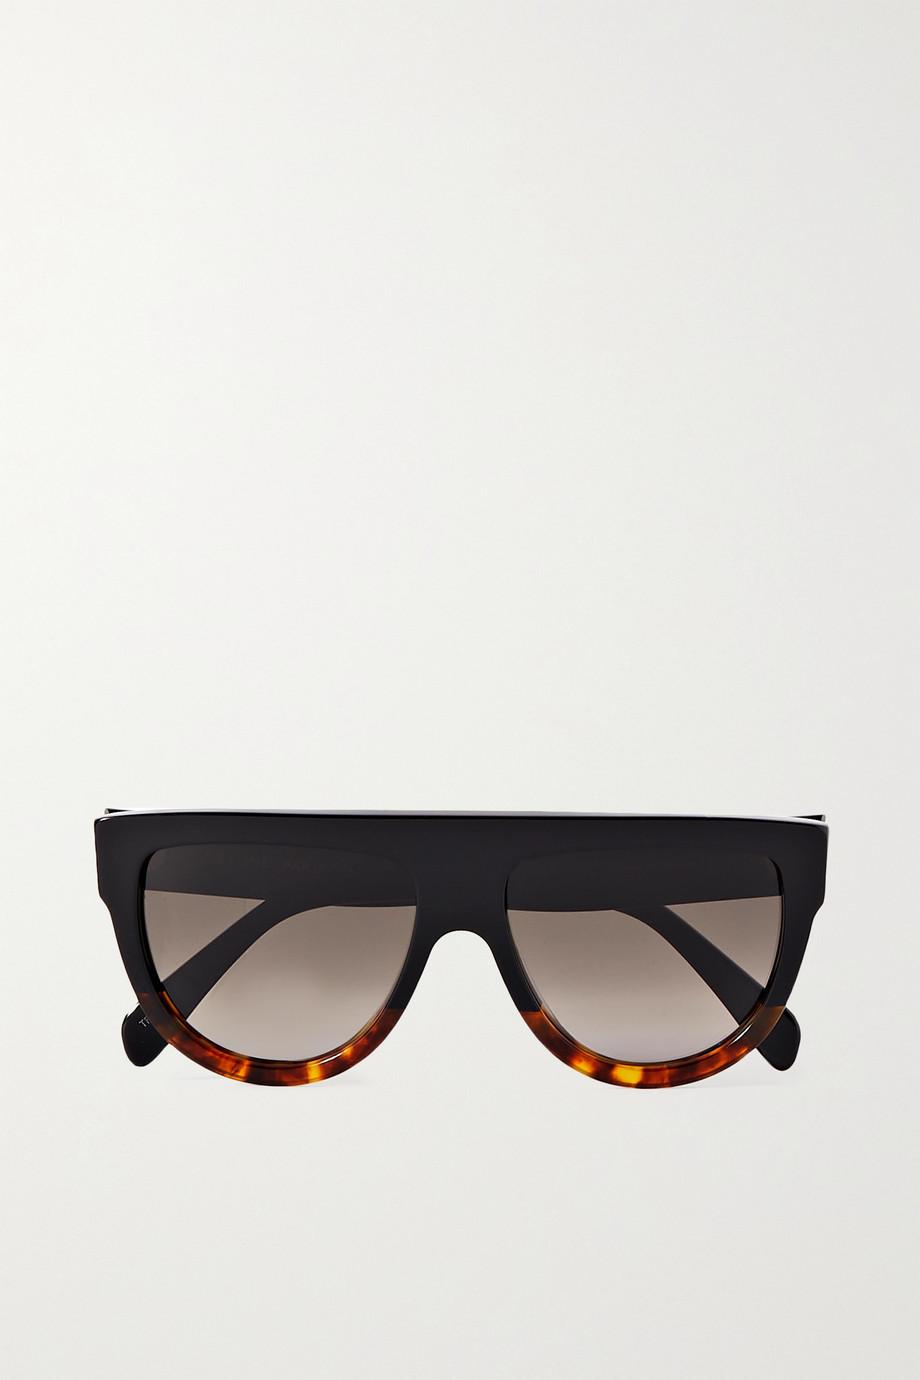 Celine Sonnenbrille mit D-Rahmen aus Azetat in Hornoptik